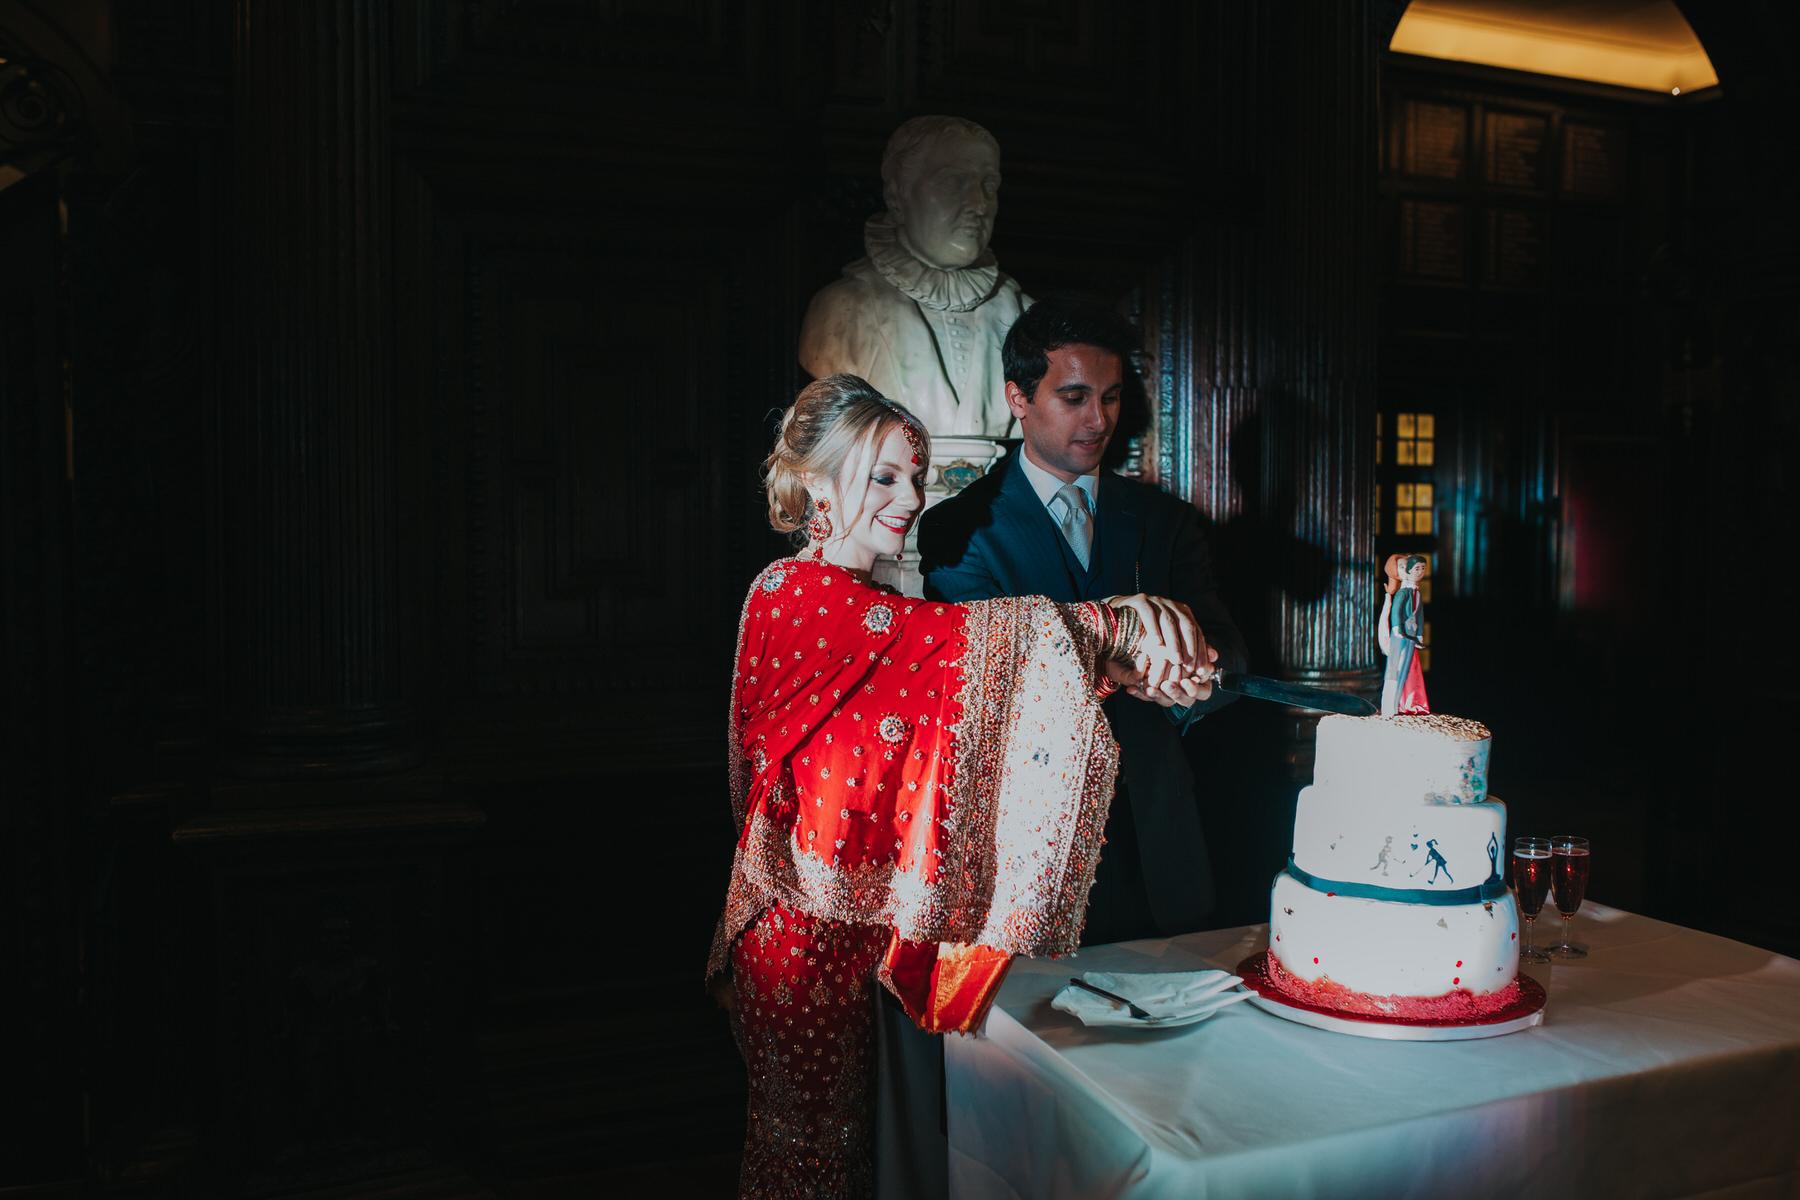 209-Anglo-Asian-London-Wedding-cutting-cake.jpg